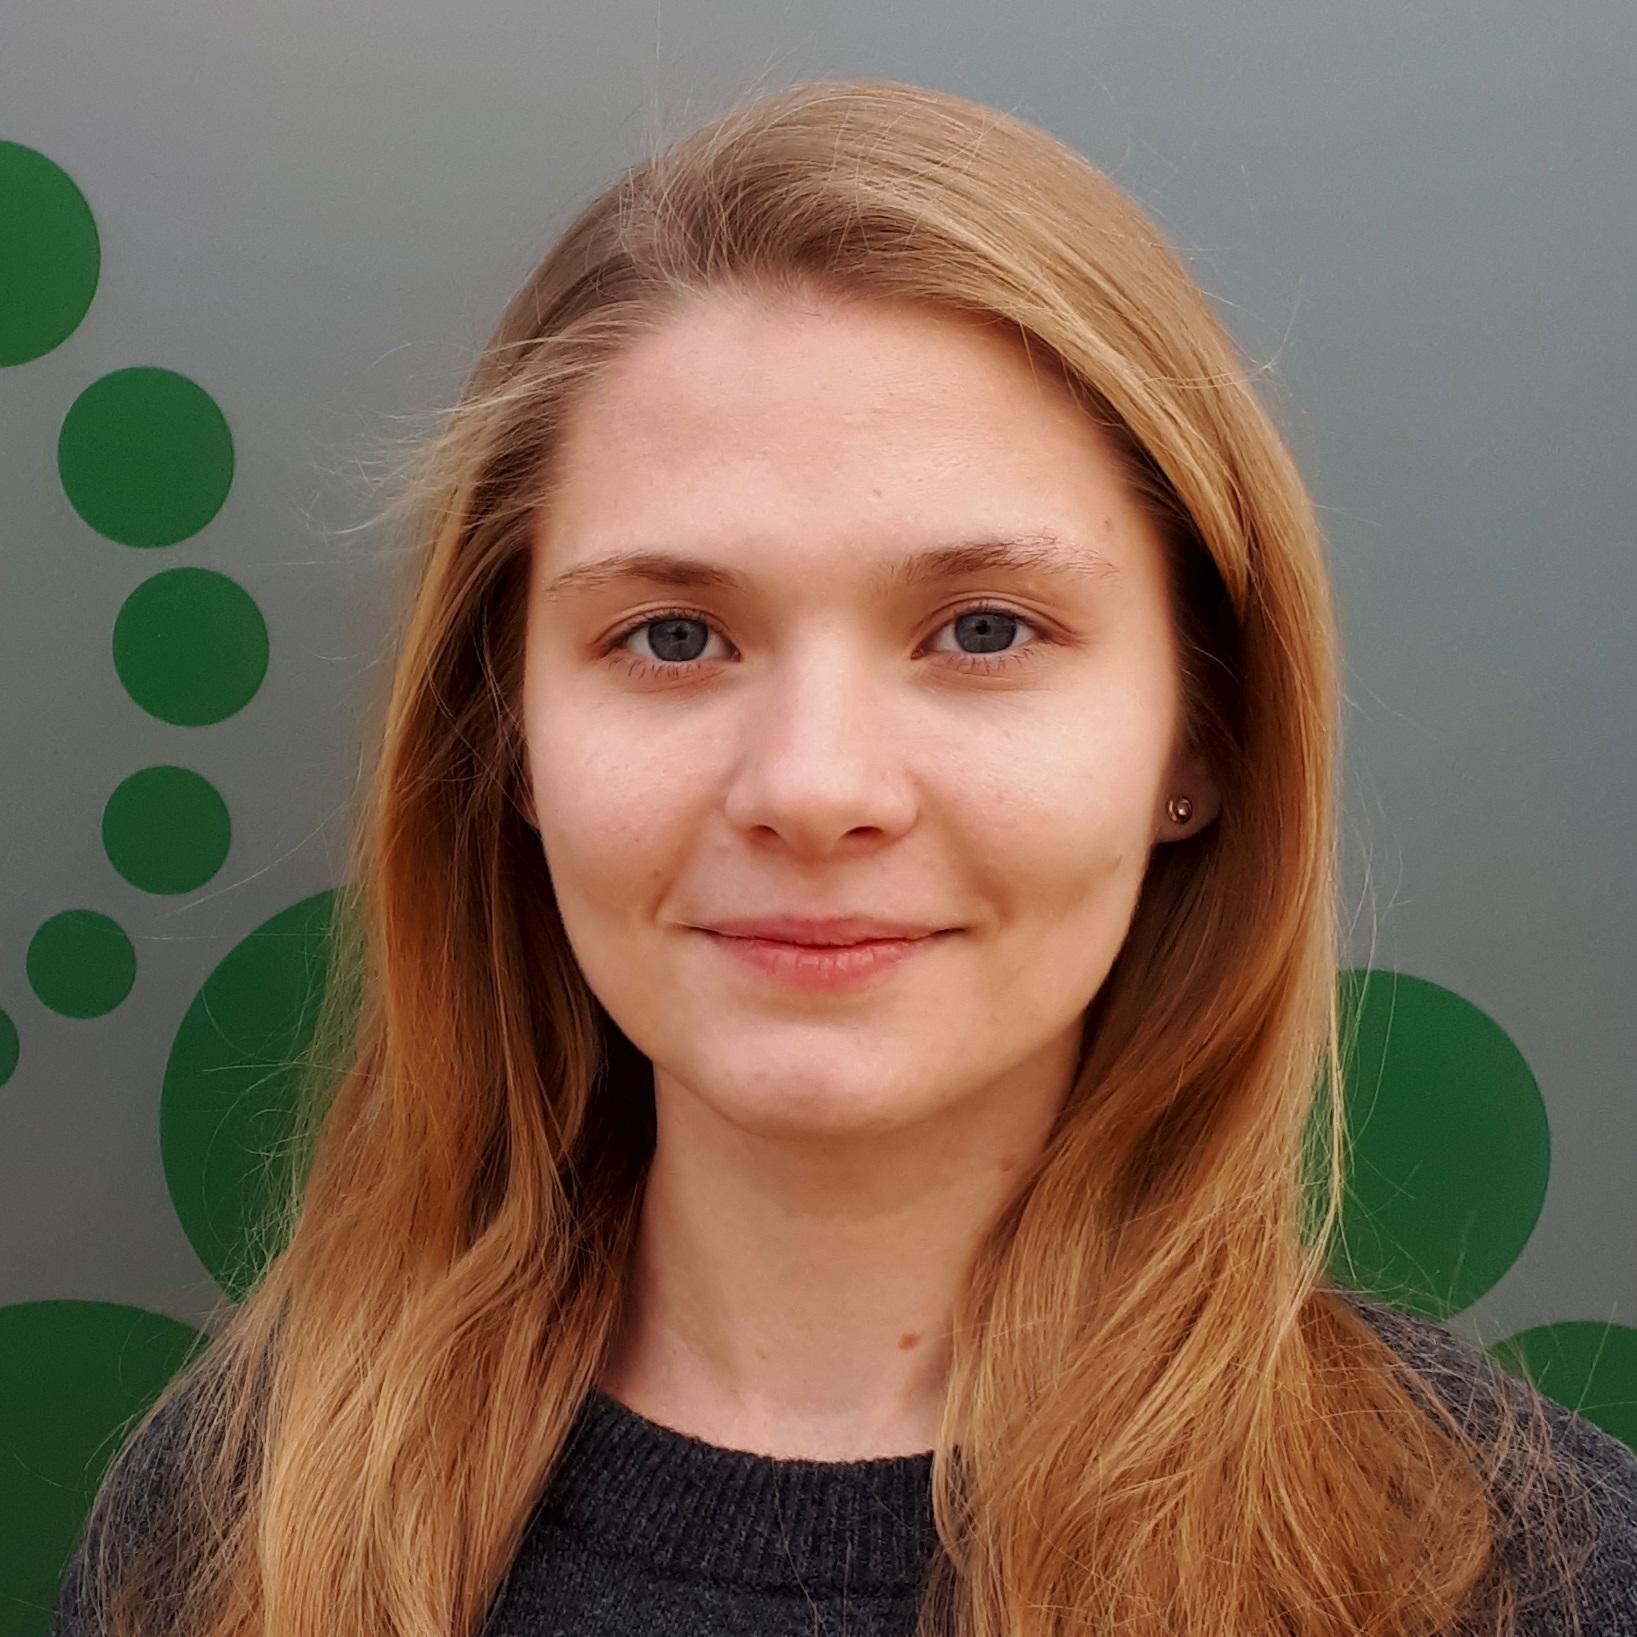 Olga Vasylieva